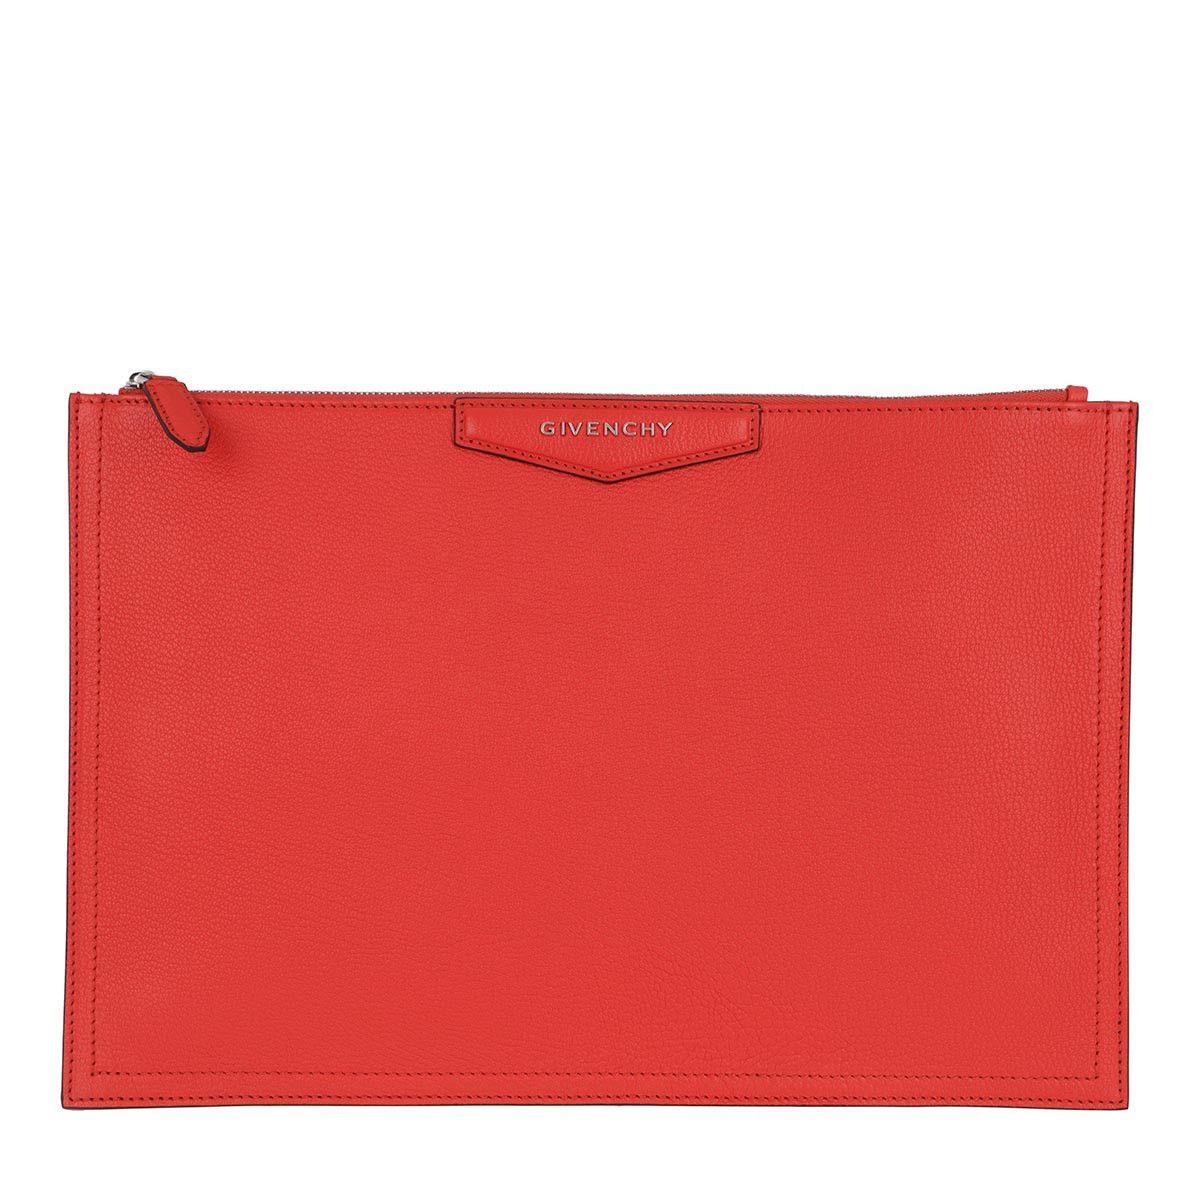 Givenchy Pochette - Antigona Pouchette Large Leather Red - in rot - für Damen